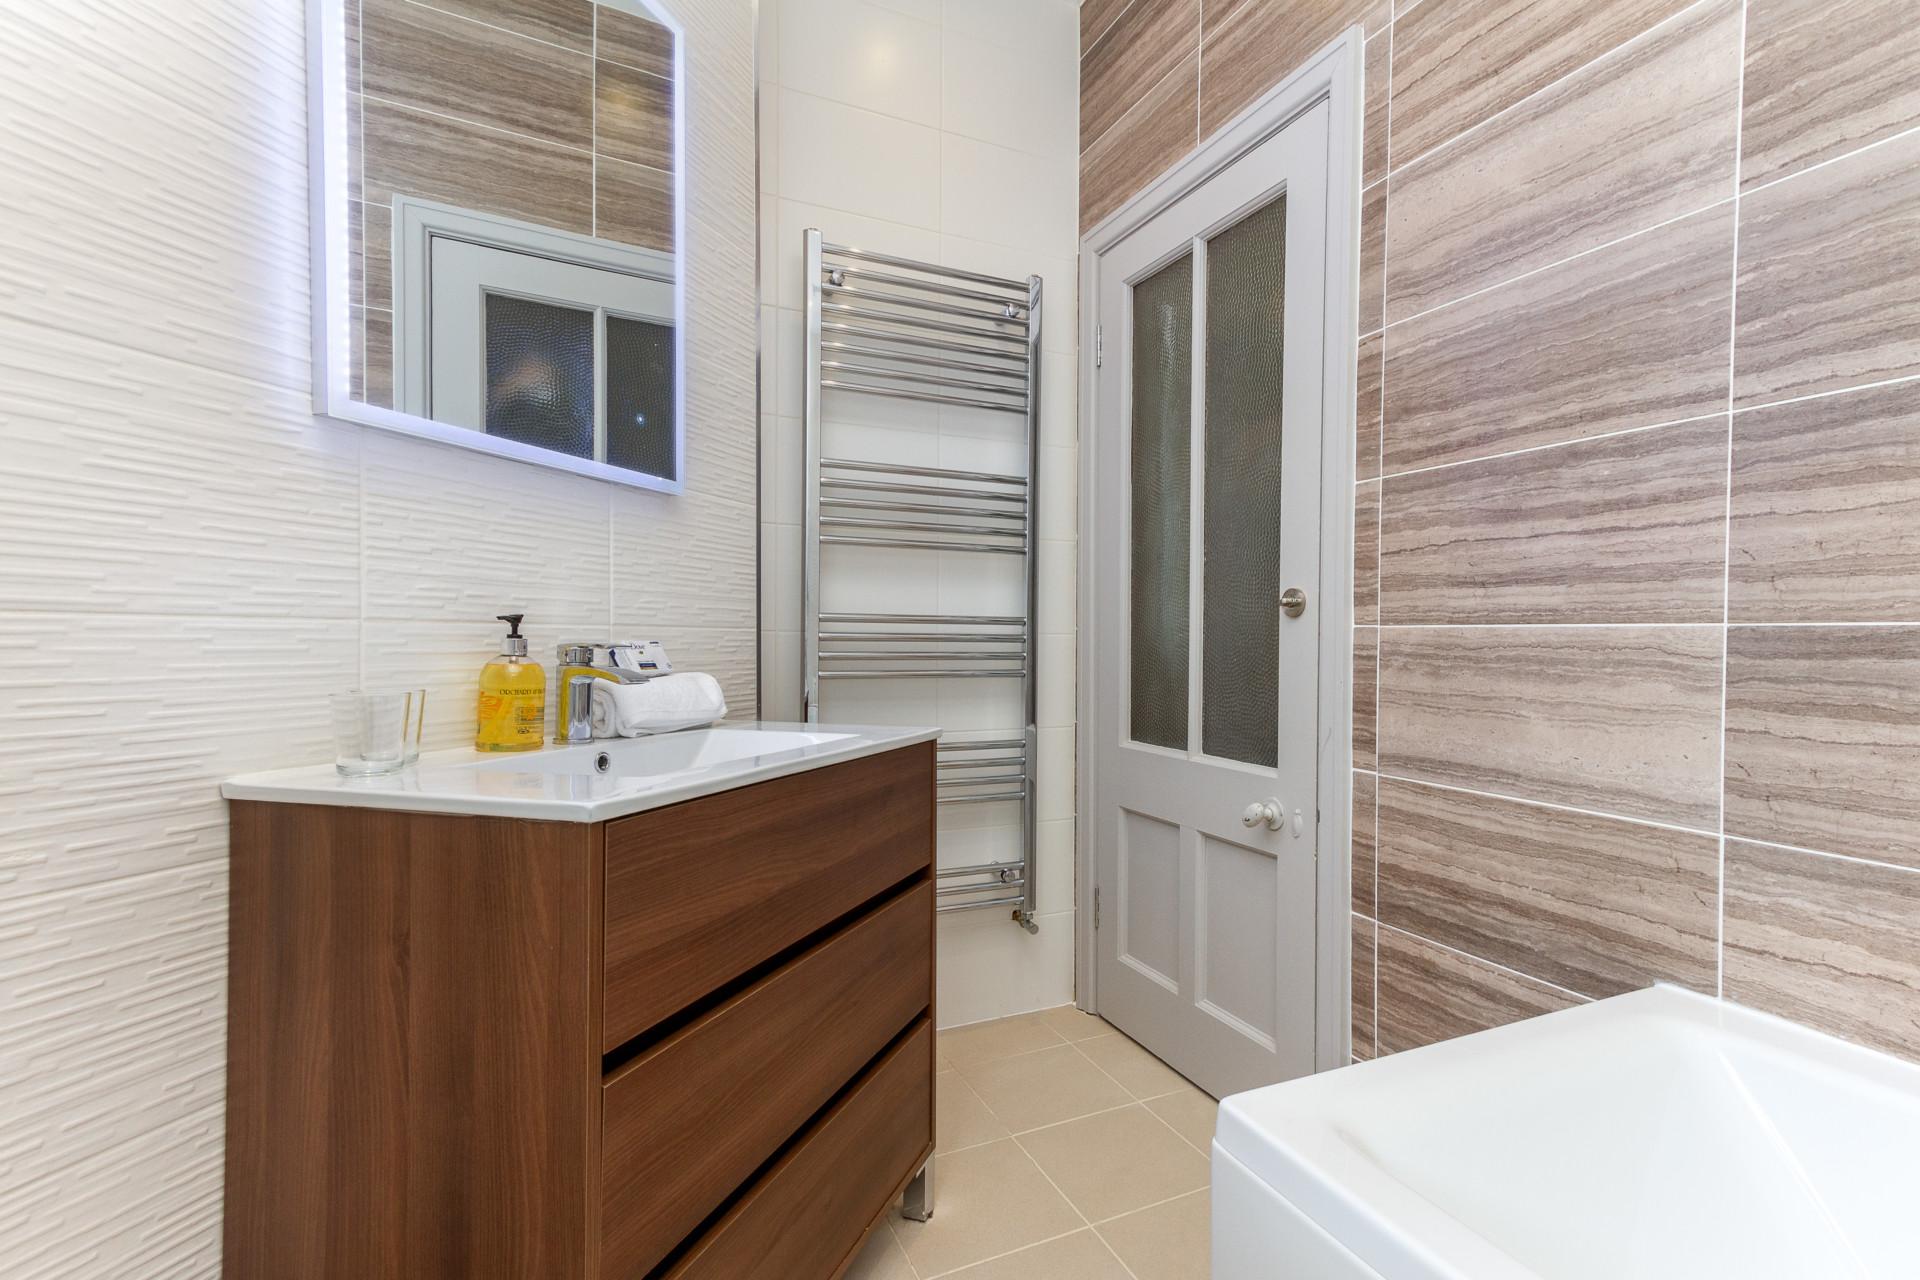 Modern bathroom with illuminated mirror